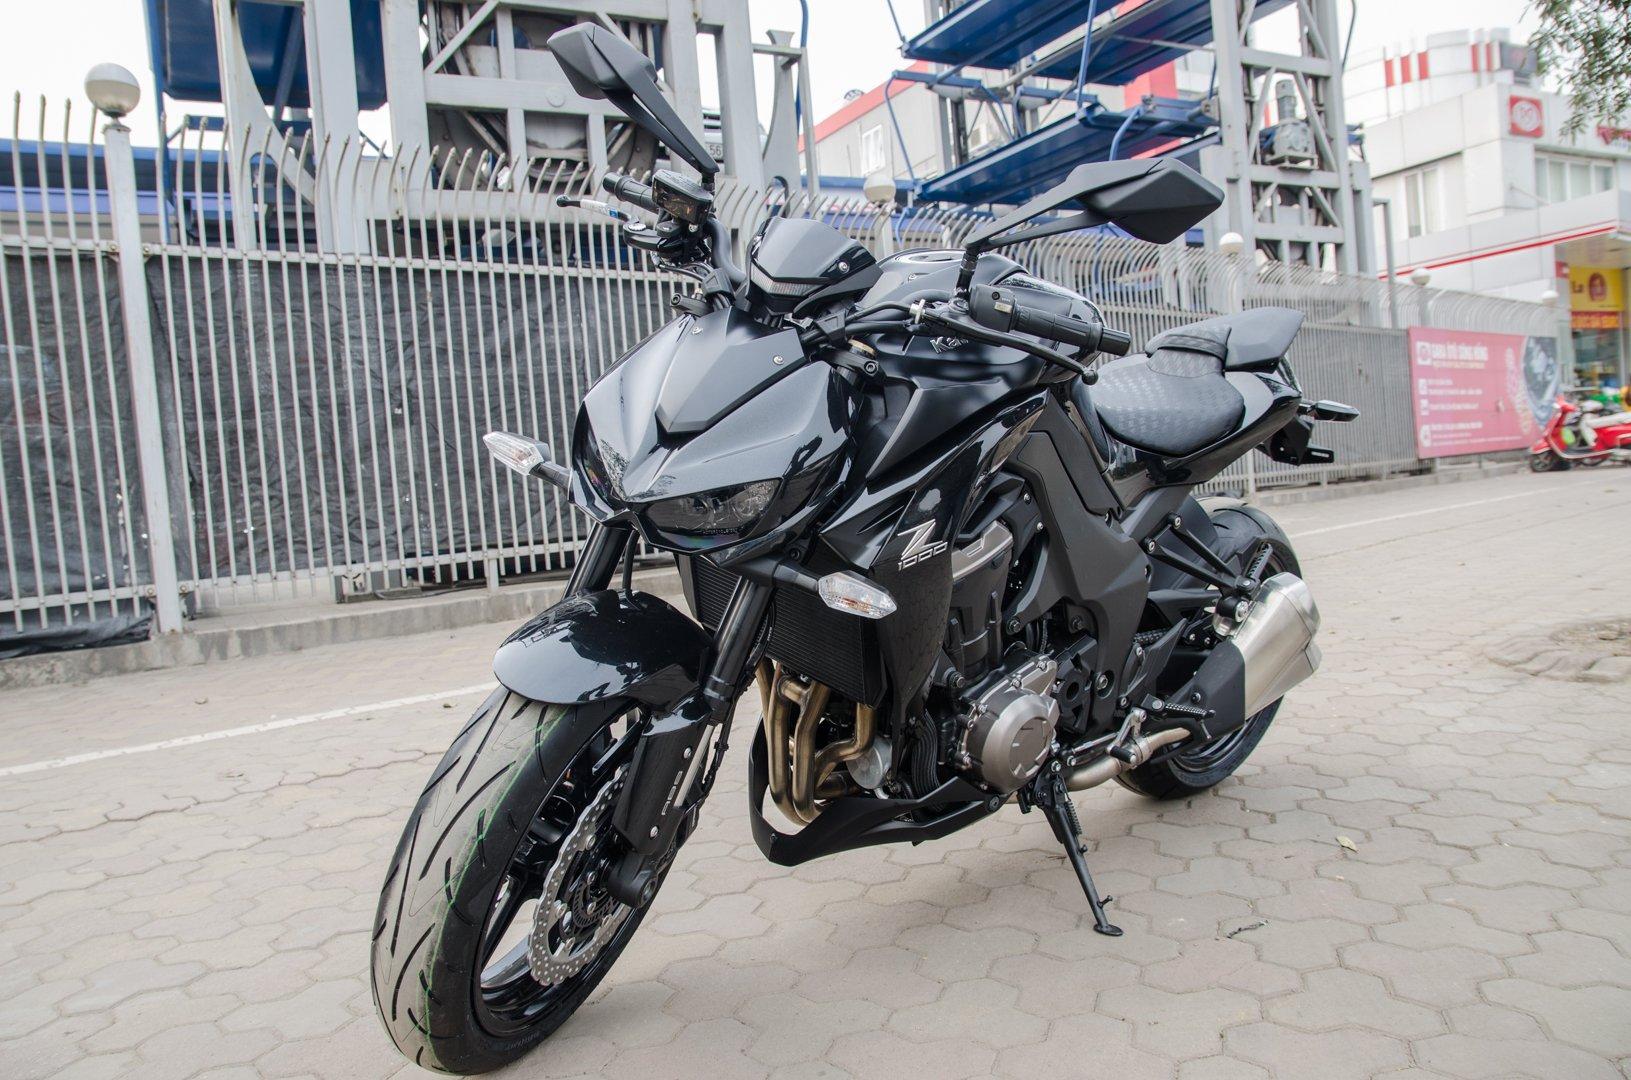 Hinh Anh Can Canh Kawasaki Z1000 2015 Black Edition Tai Ha Noi So 1